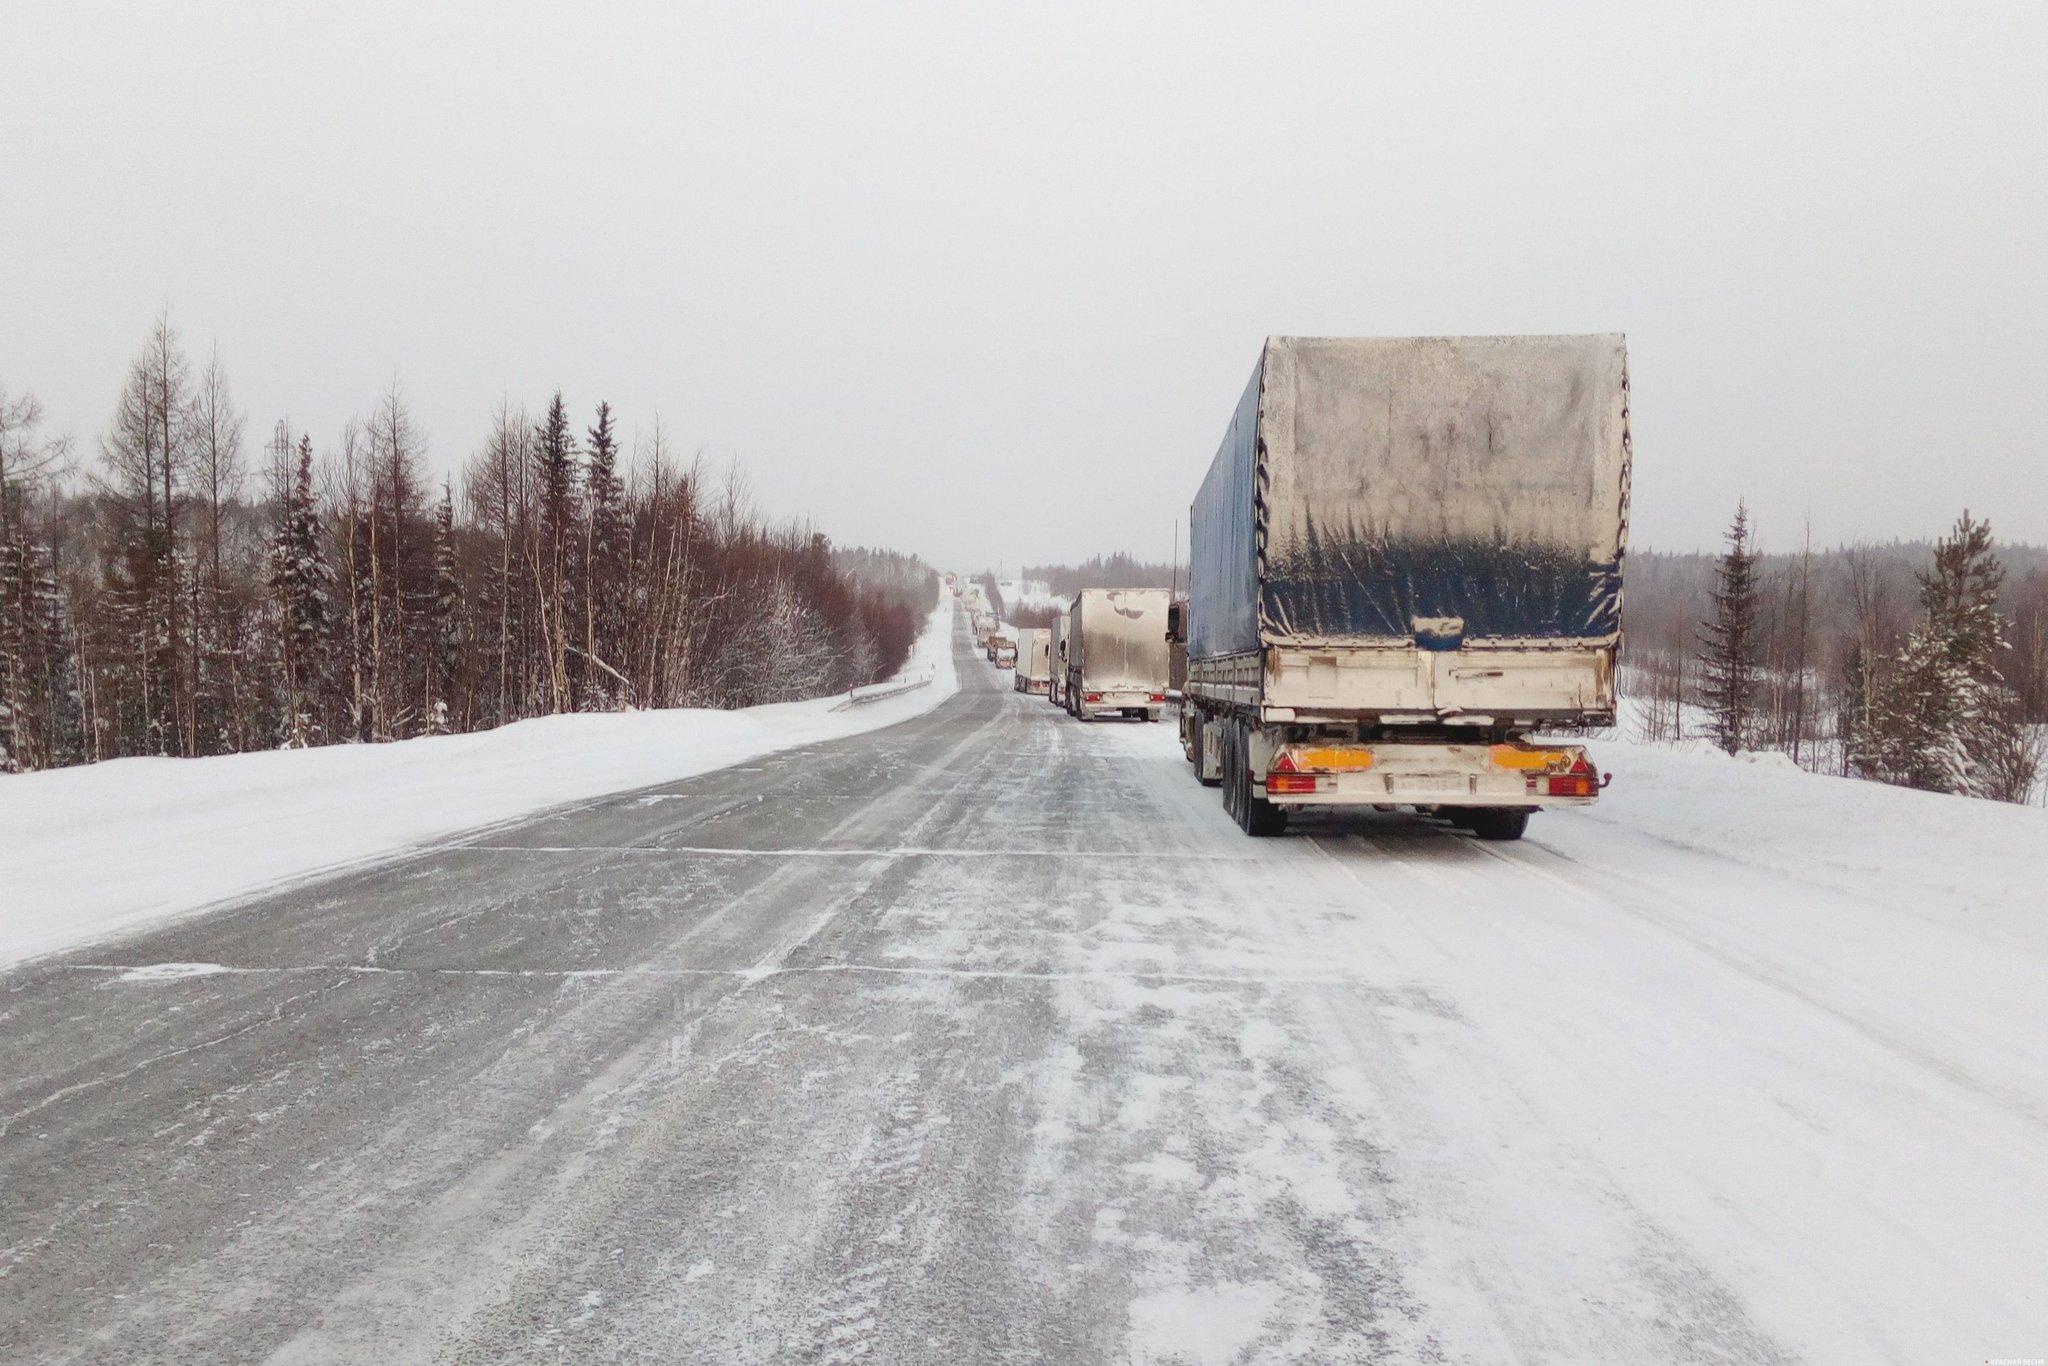 Автоколонна на зимней дороге